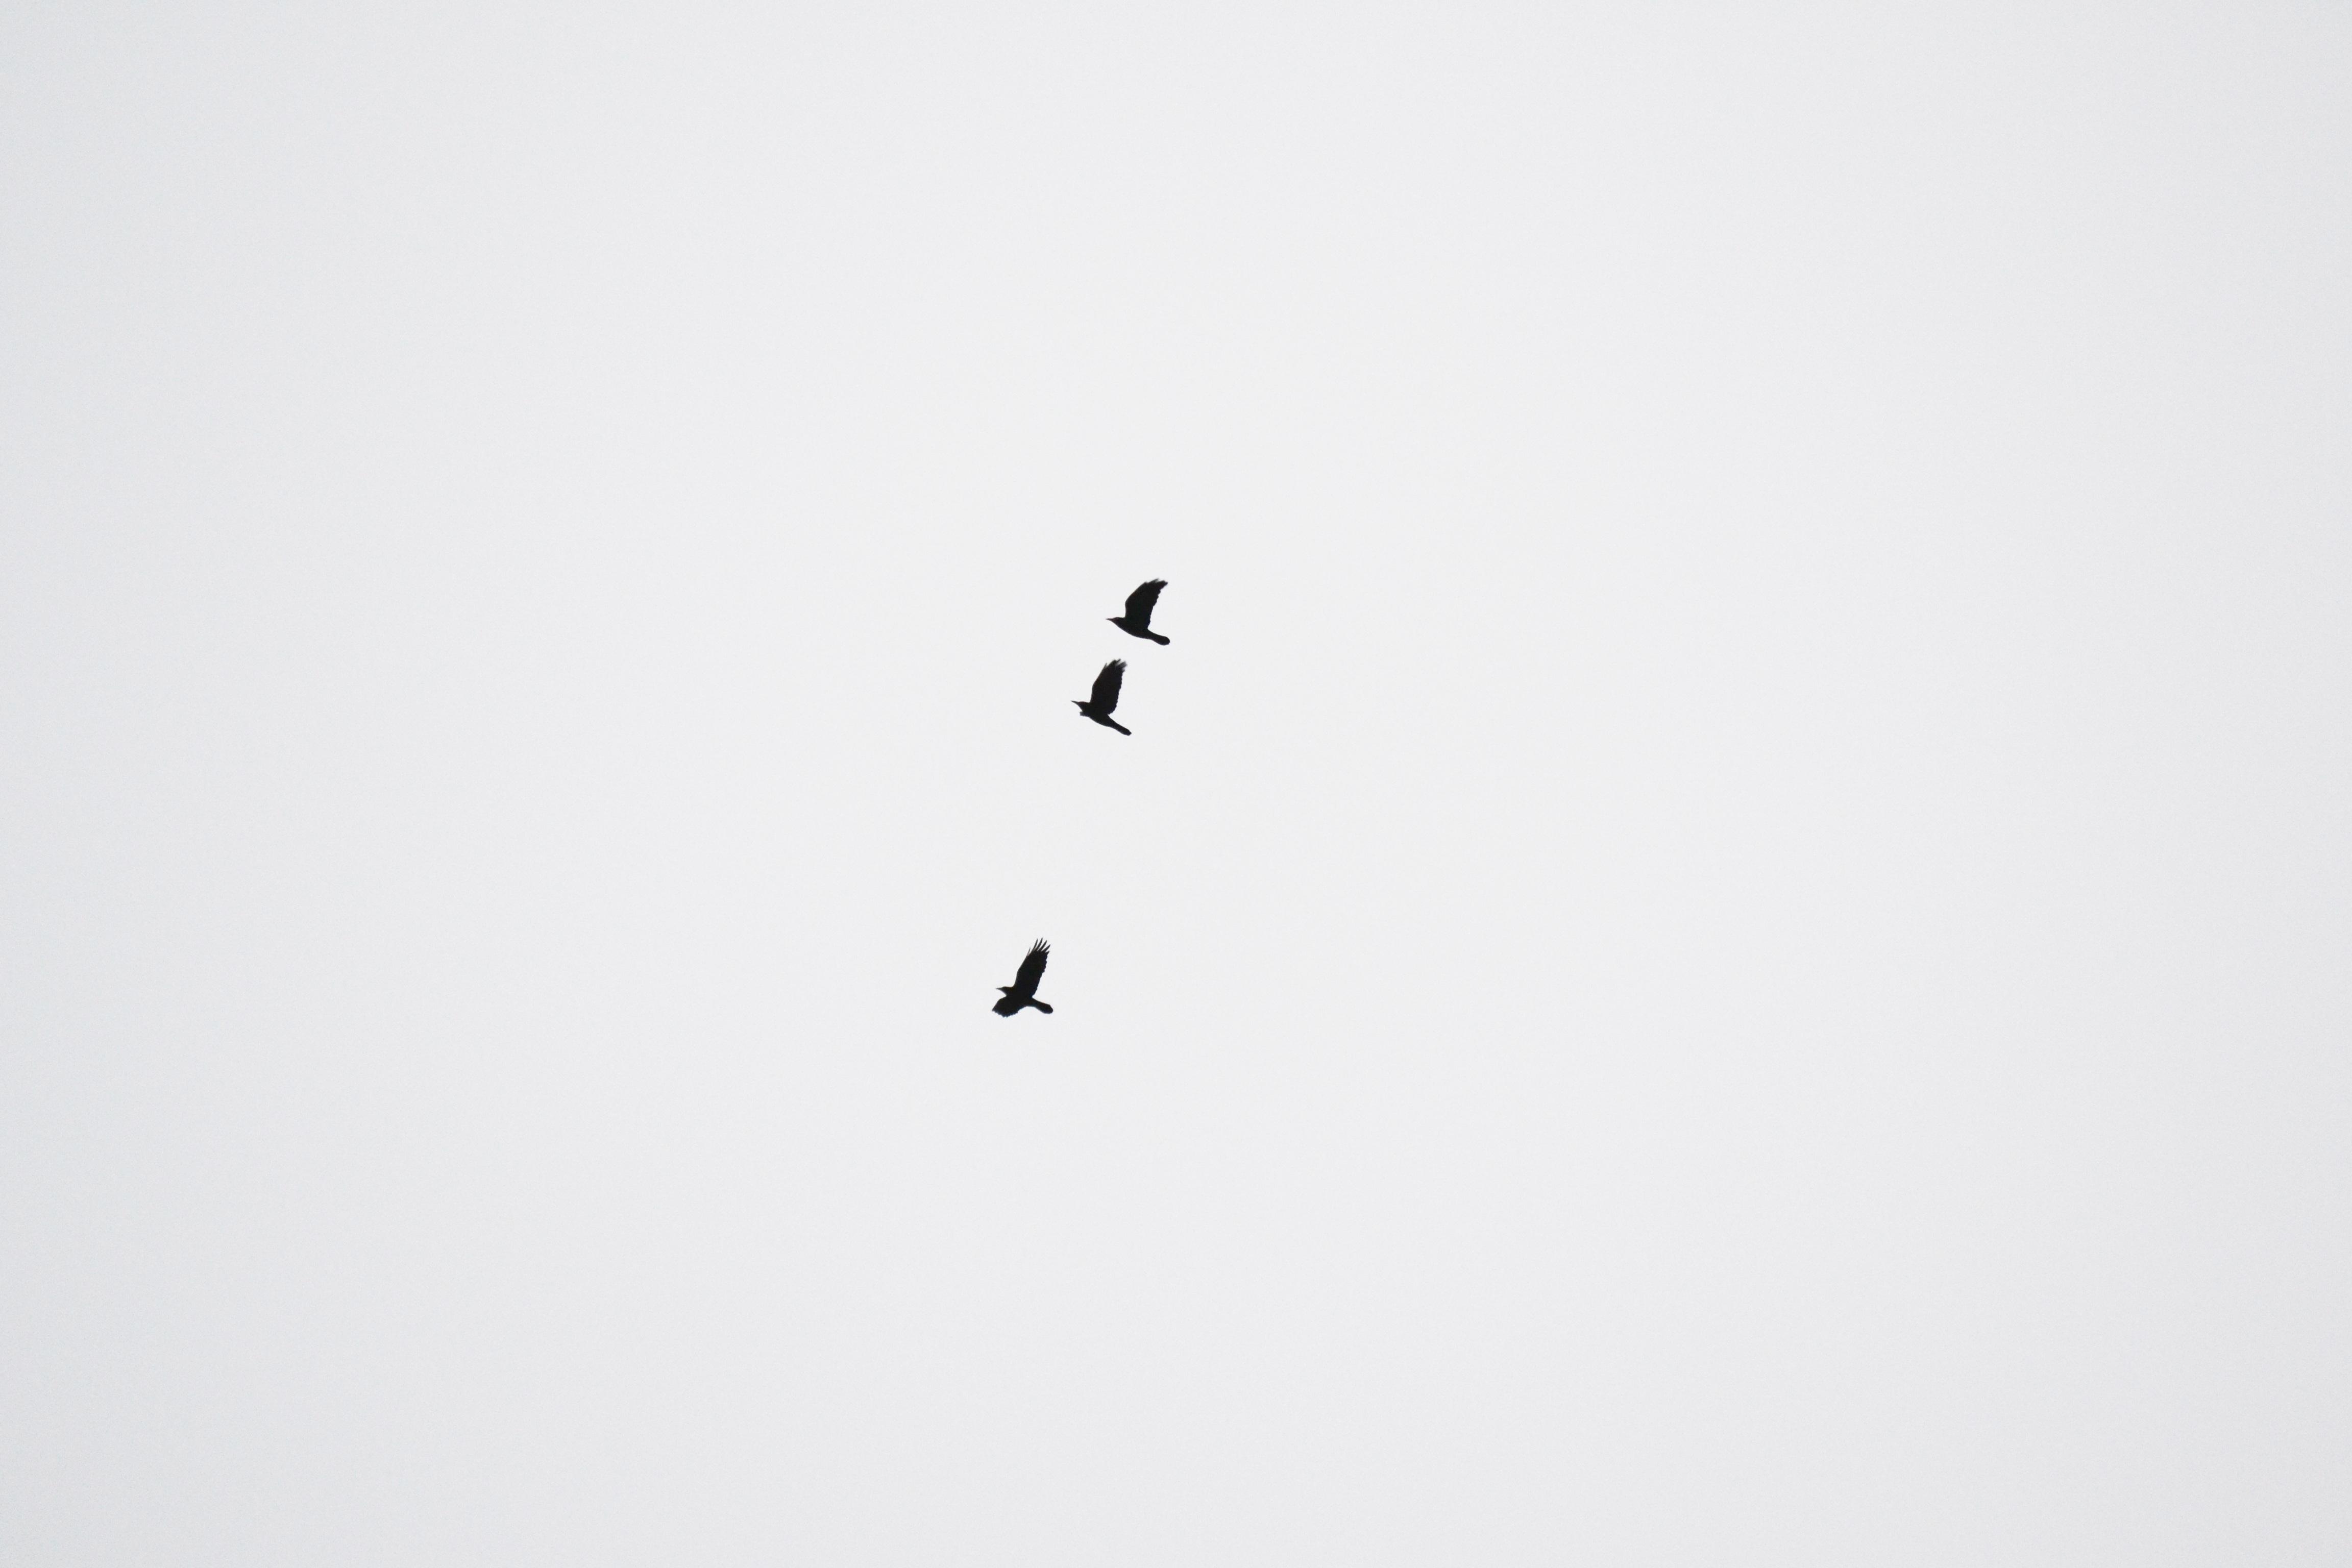 Gambar Sayap Langit Putih Penerbangan Garis Burung